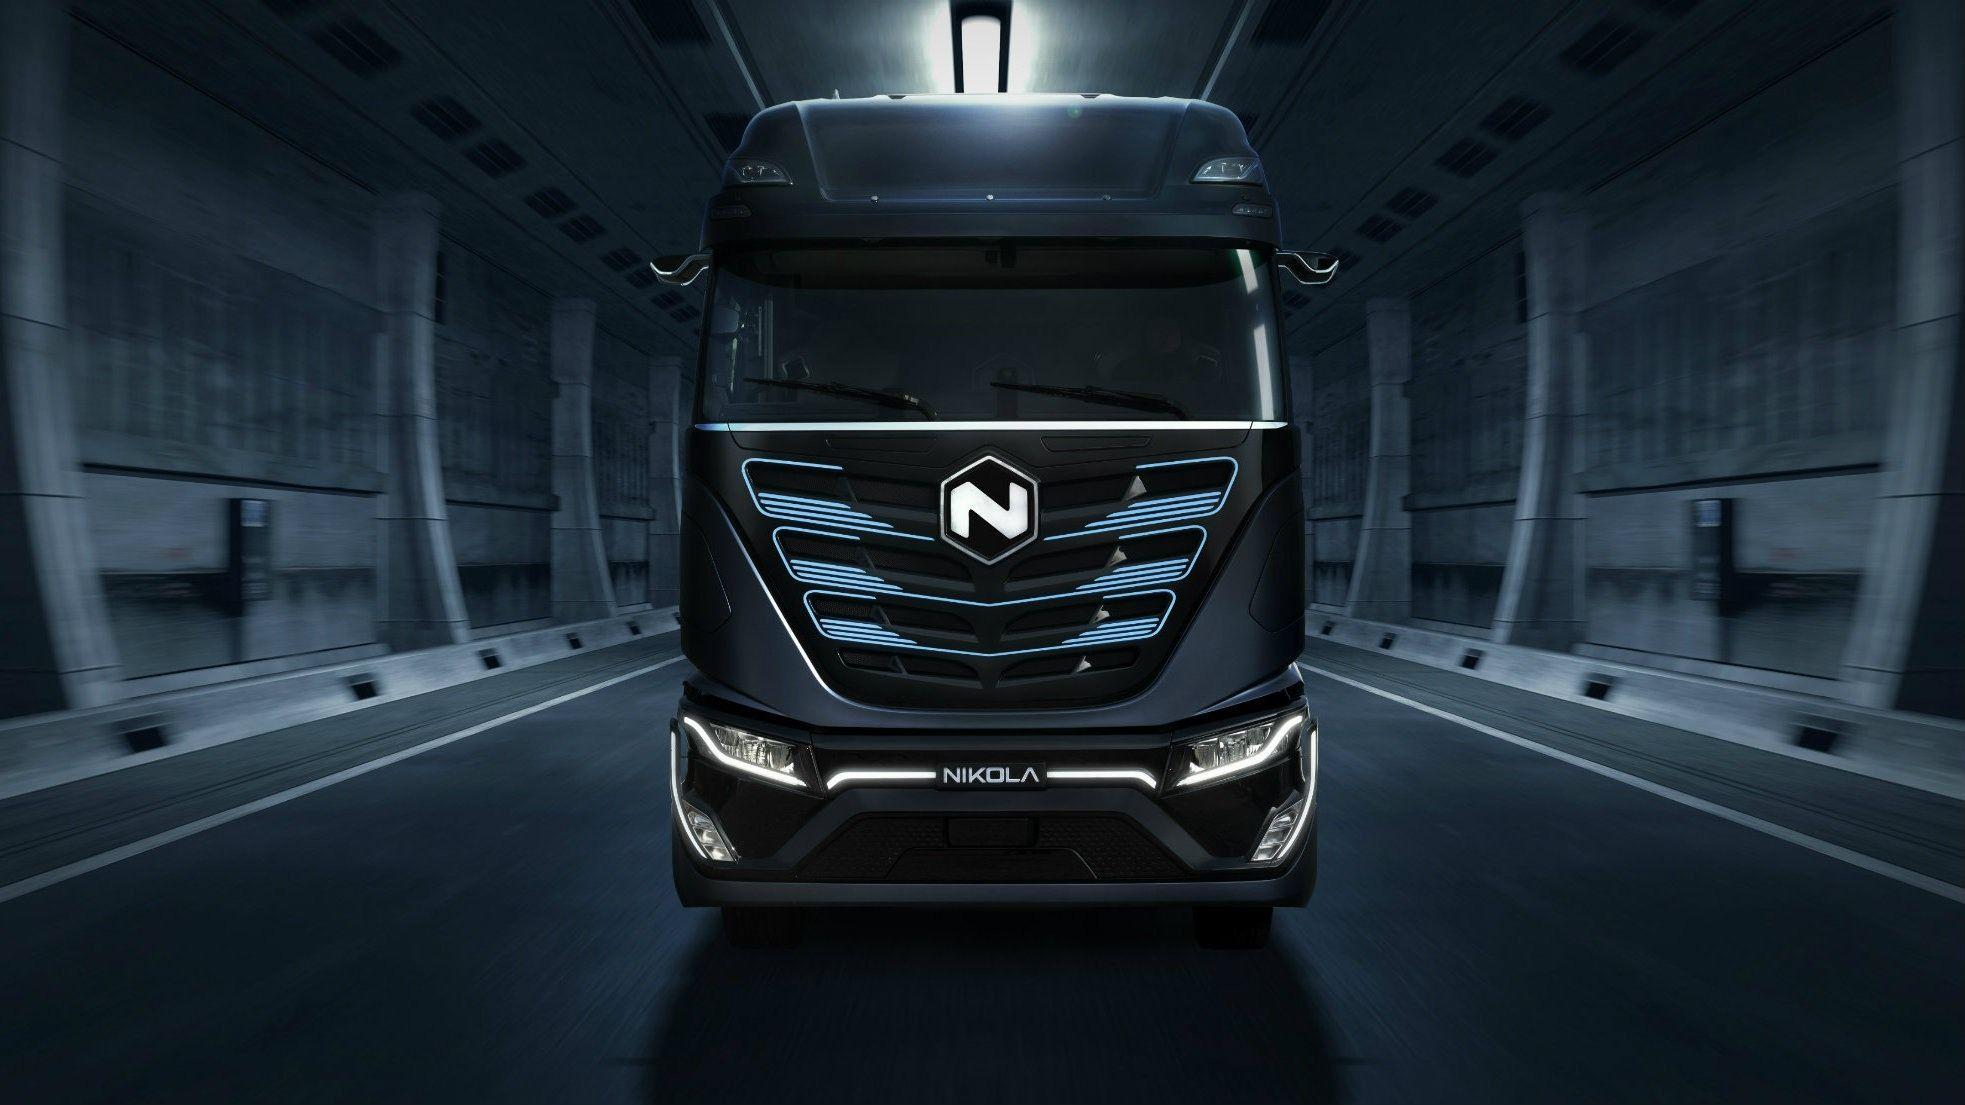 Nikola Semi Truck